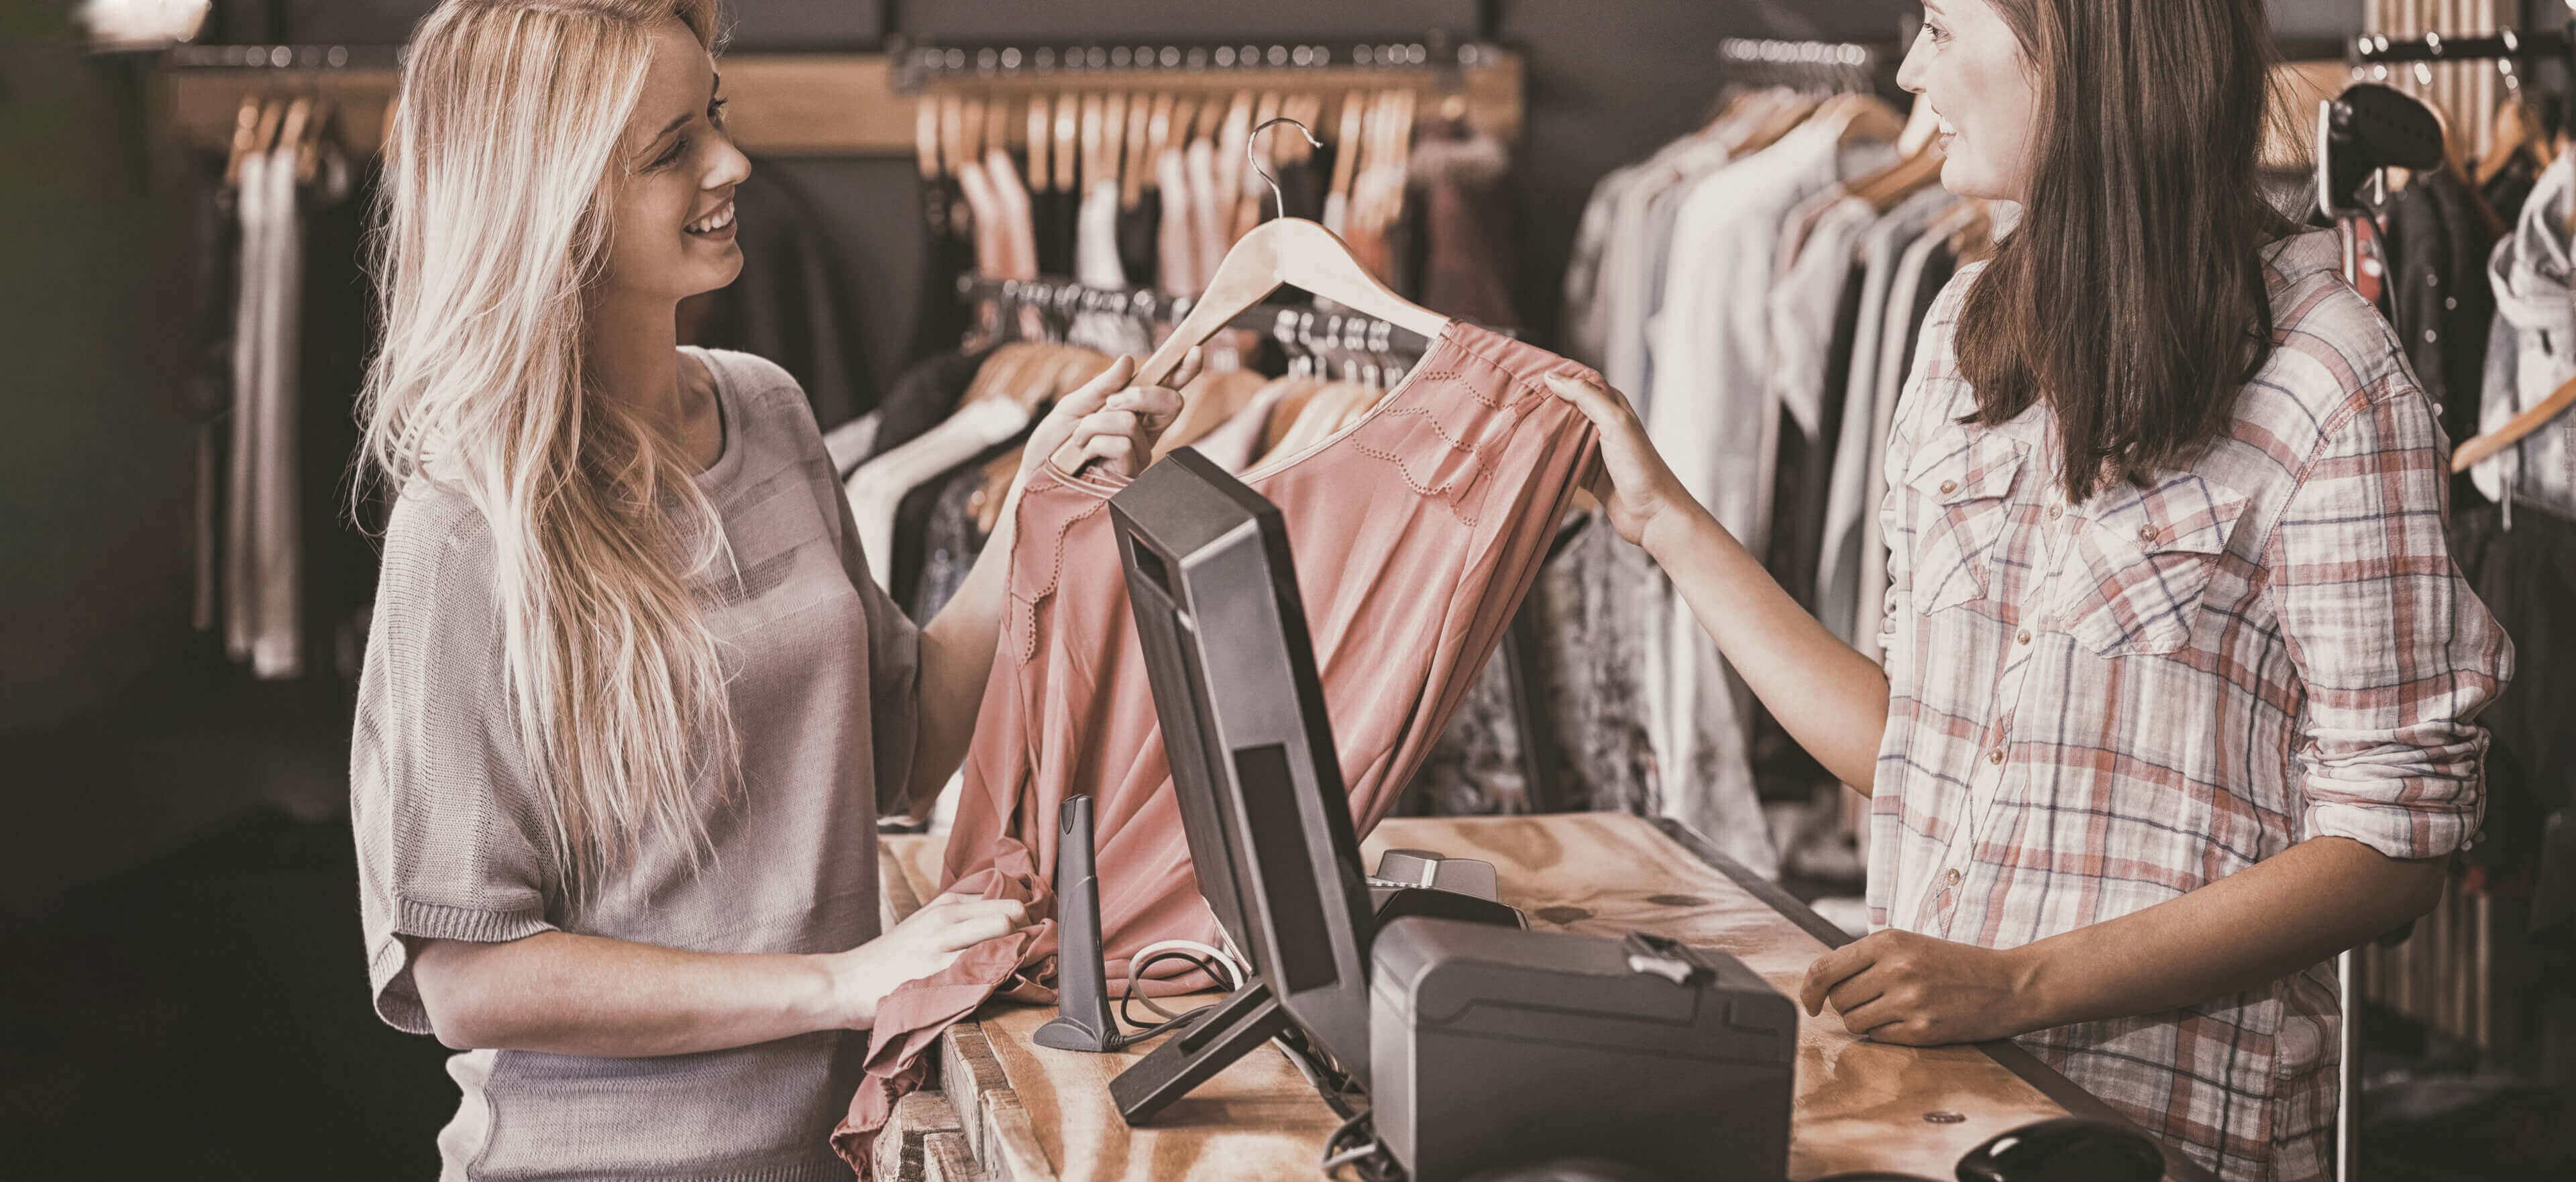 MAIN-unified-commerce-payment-retail-sotre-head_118485404